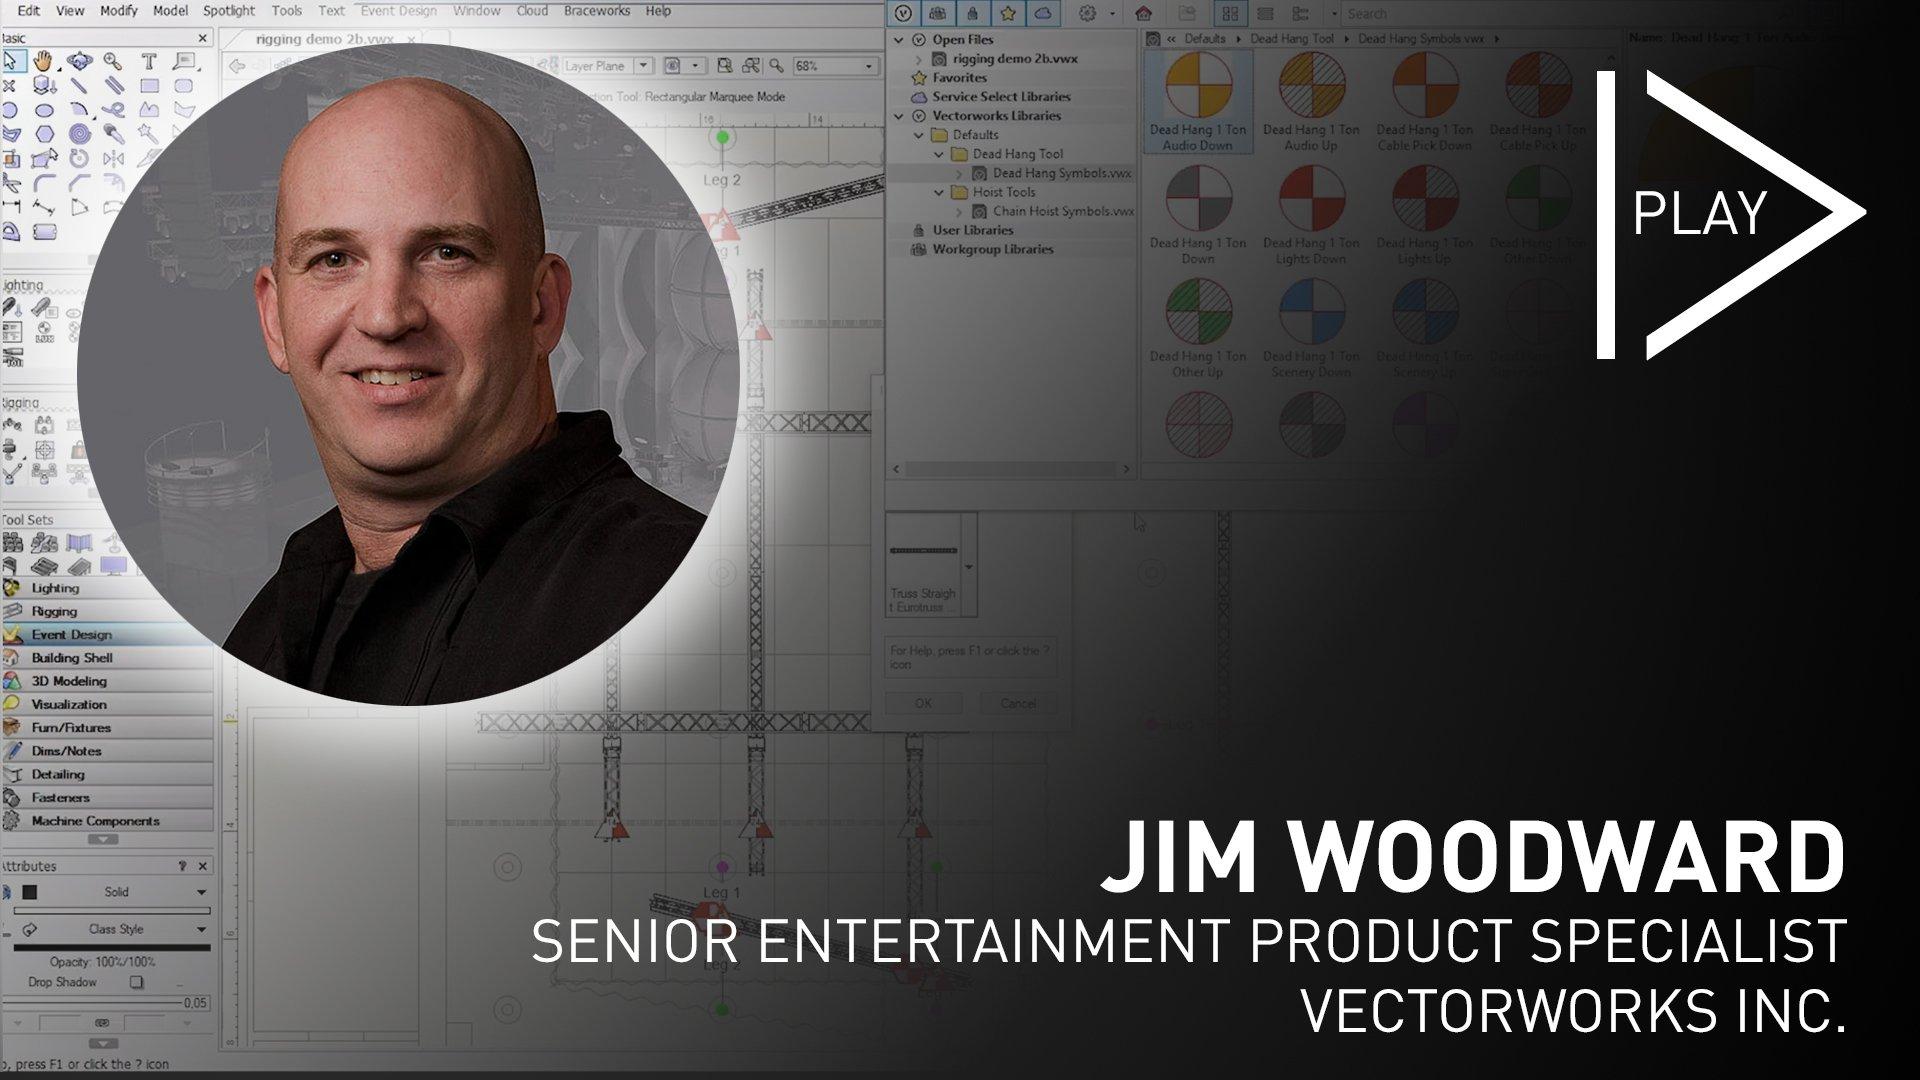 Jim_Woodward-PLS-Vectorworks-Spotlight-2020